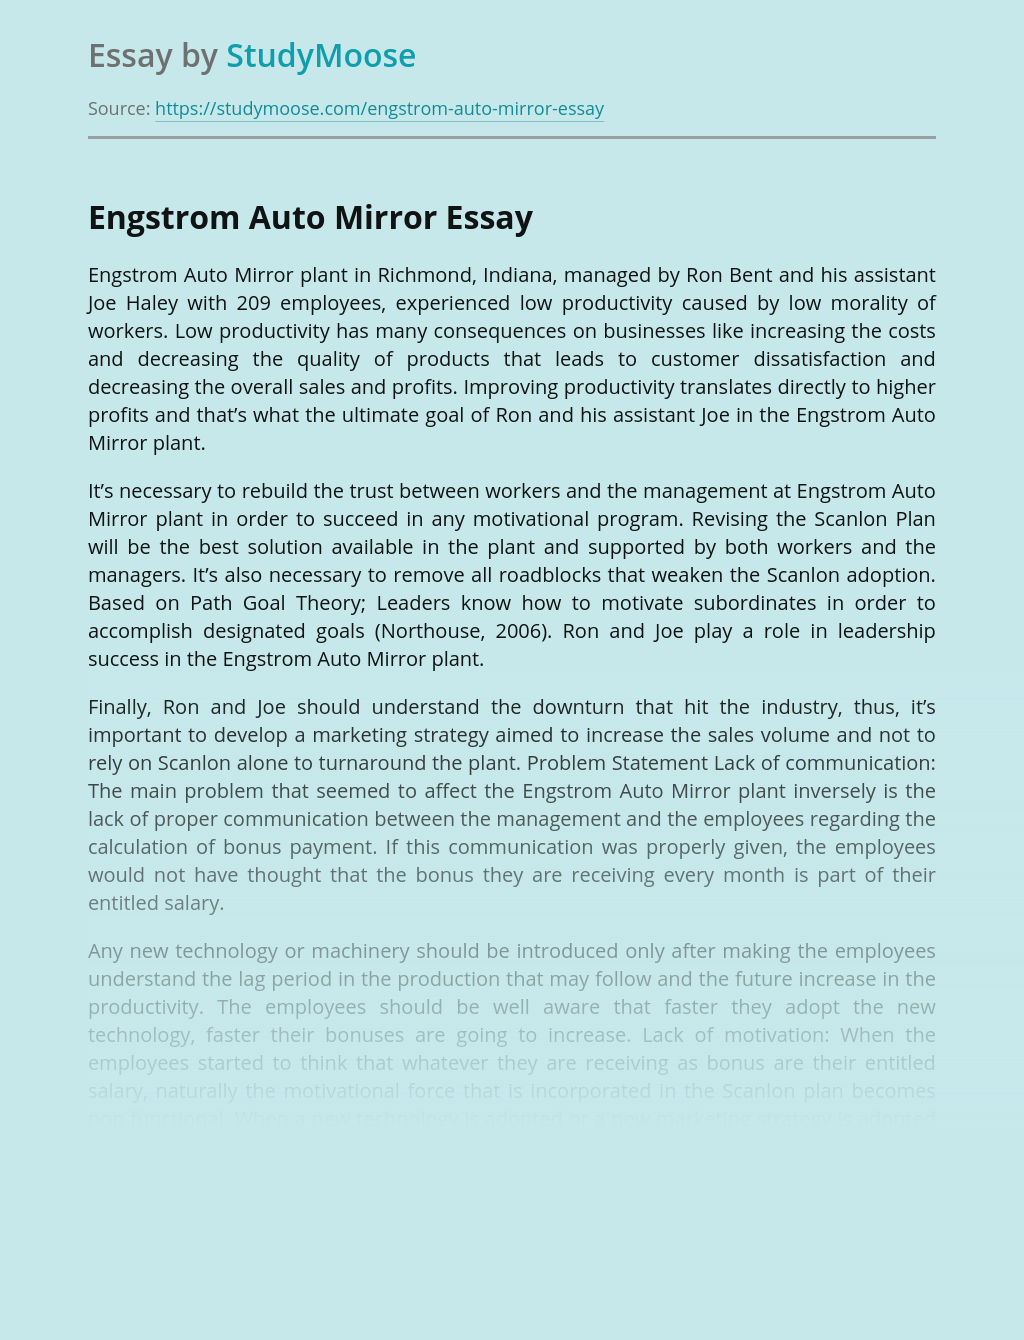 Case Study Analysis: Engstrom Auto Mirror Plant